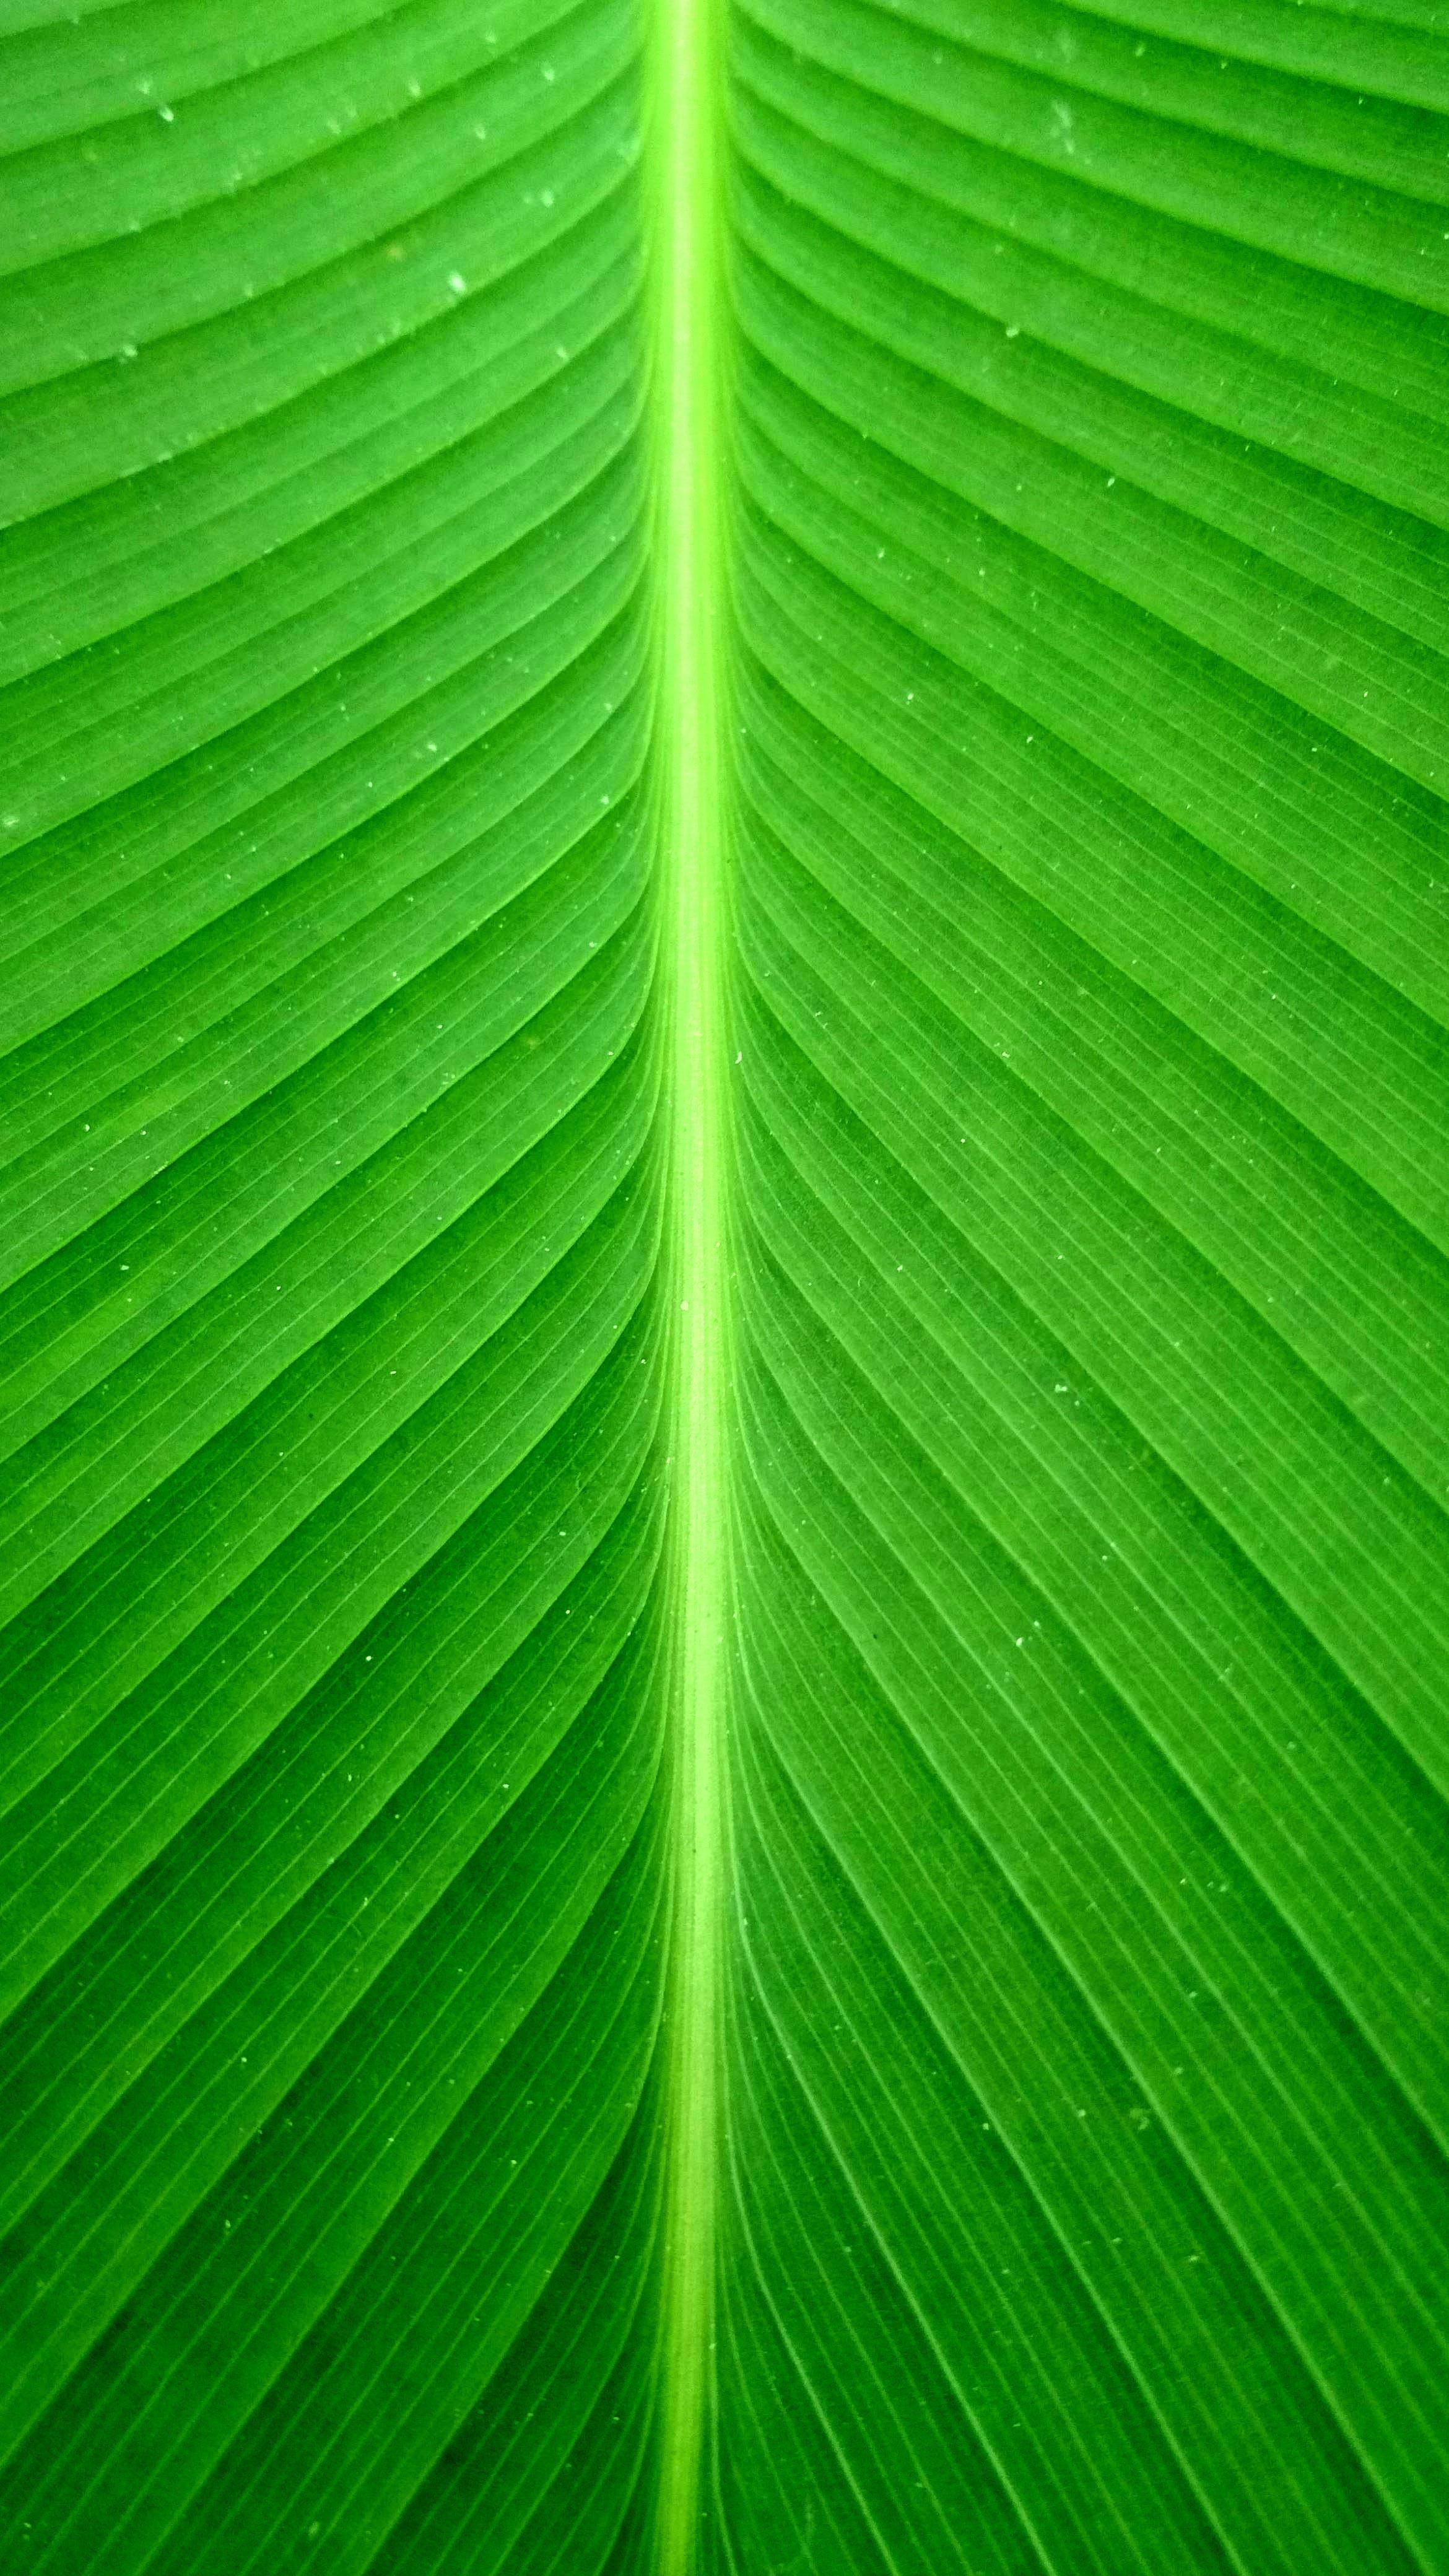 green, line, portrait